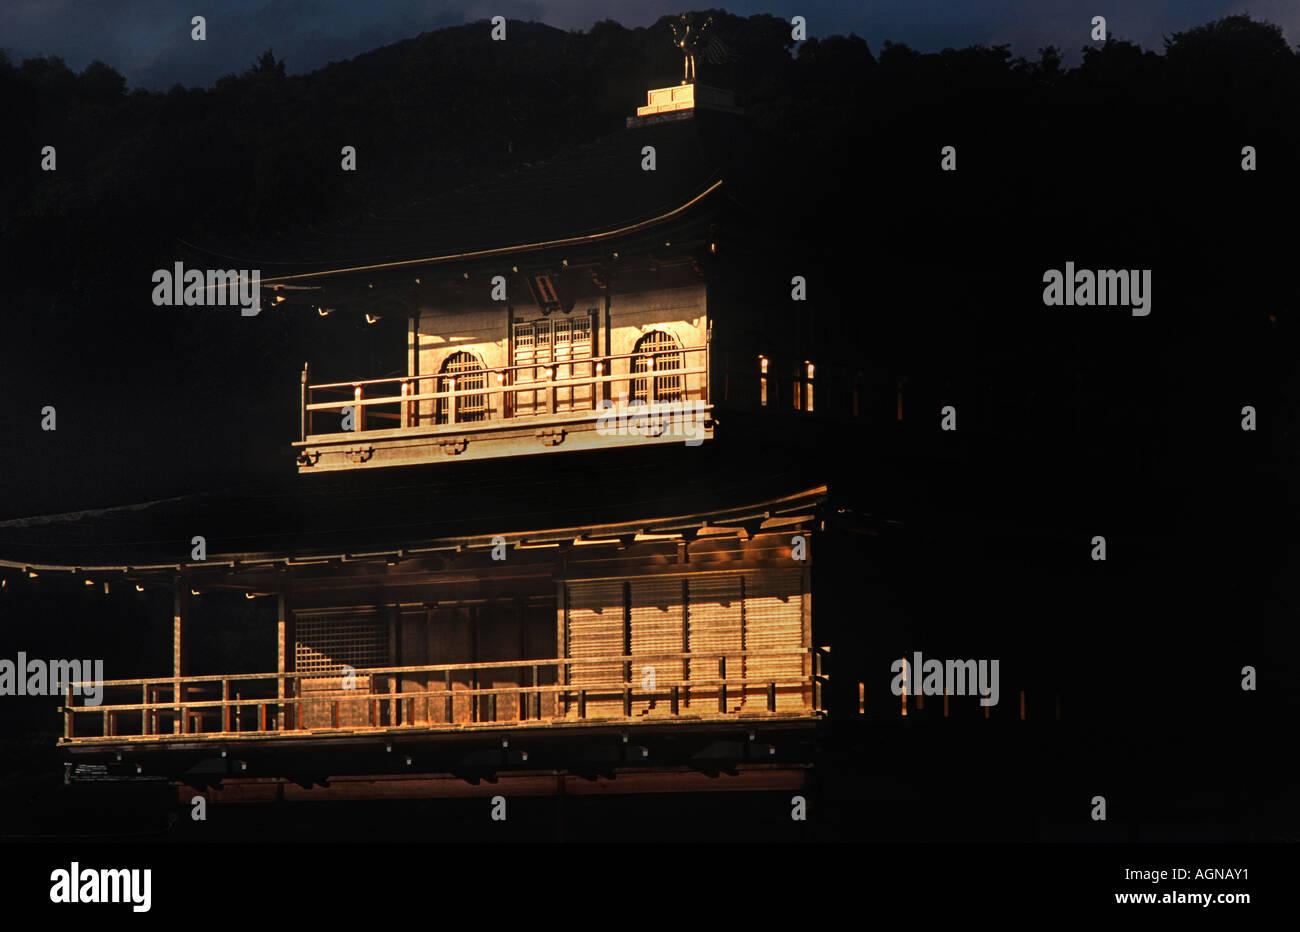 Detail of Golden pavilion Kinkakuji Kyoto Japan The last rays of sunlight illuminate the gilded facade - Stock Image